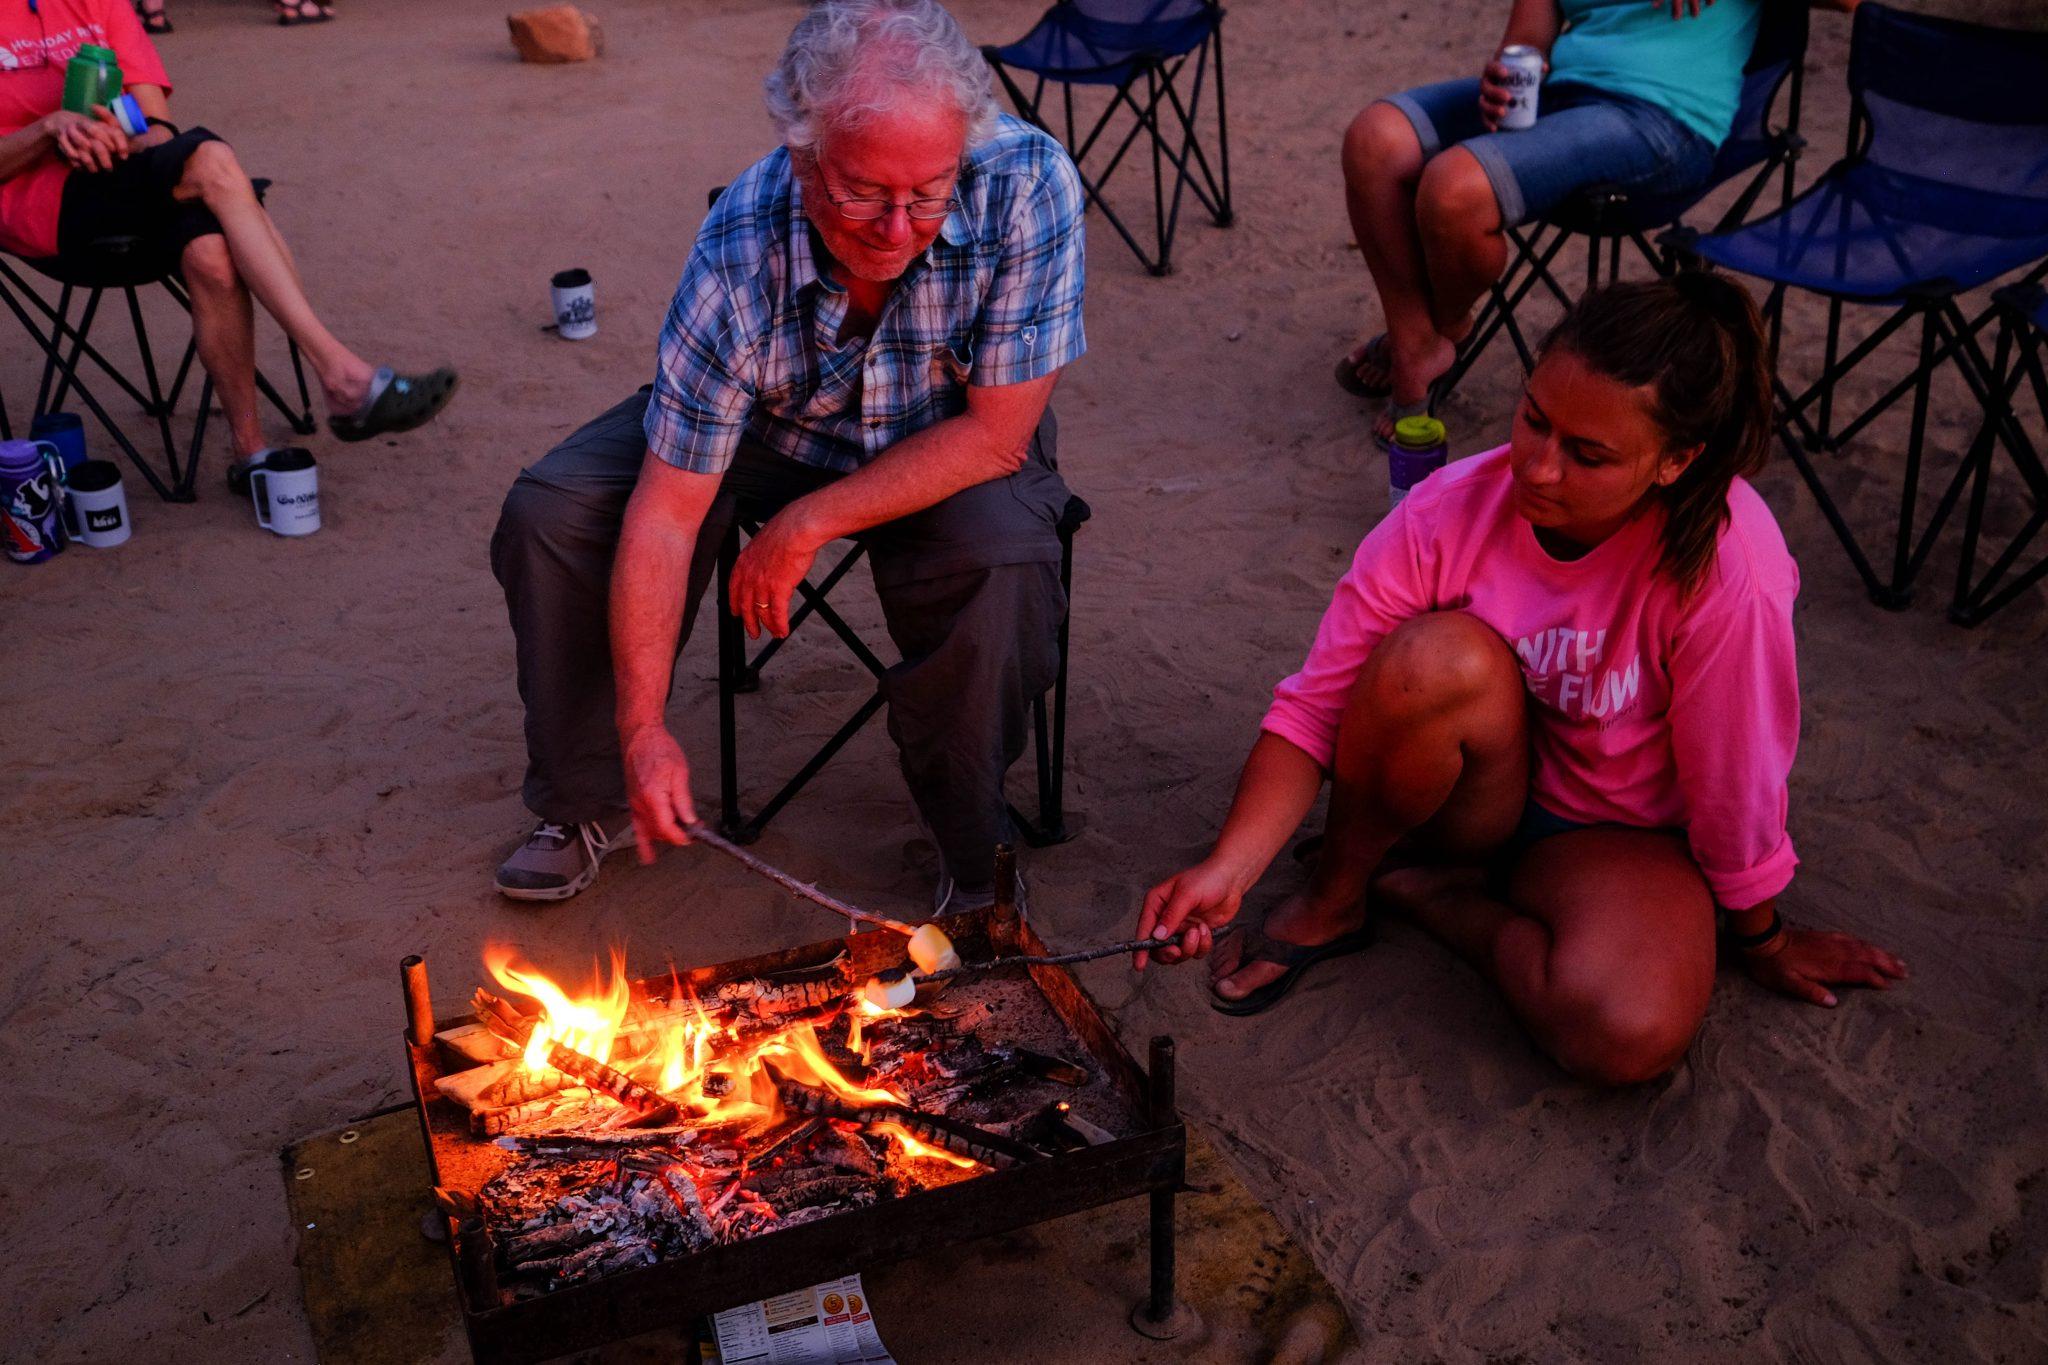 Roasting Marshmallows around campfire